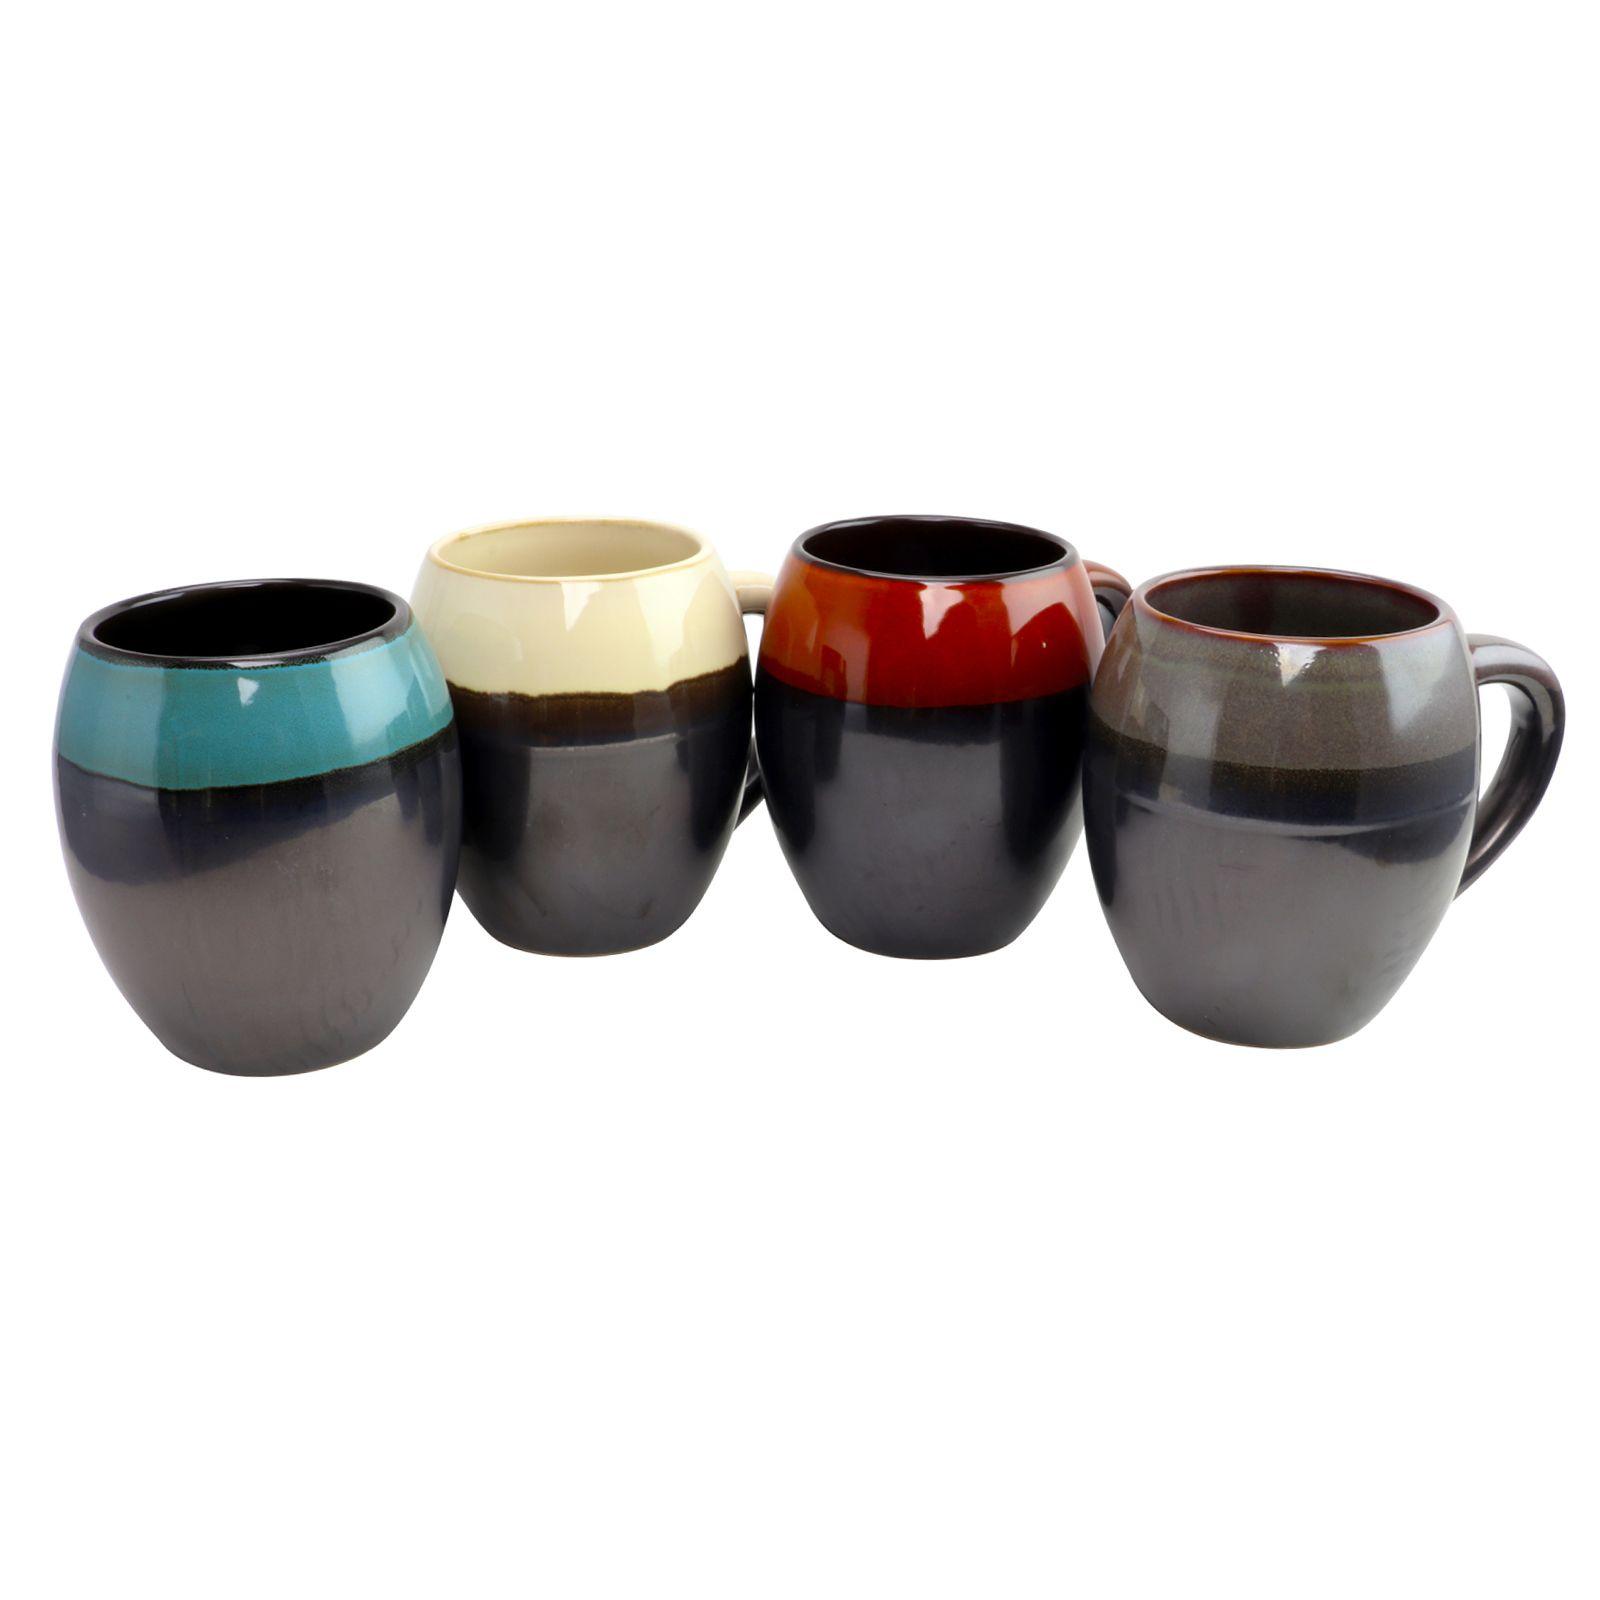 65317777c9b Gibson Home Soroca 4 Piece 19.5 oz Mug Set in Assorted Colors in ...